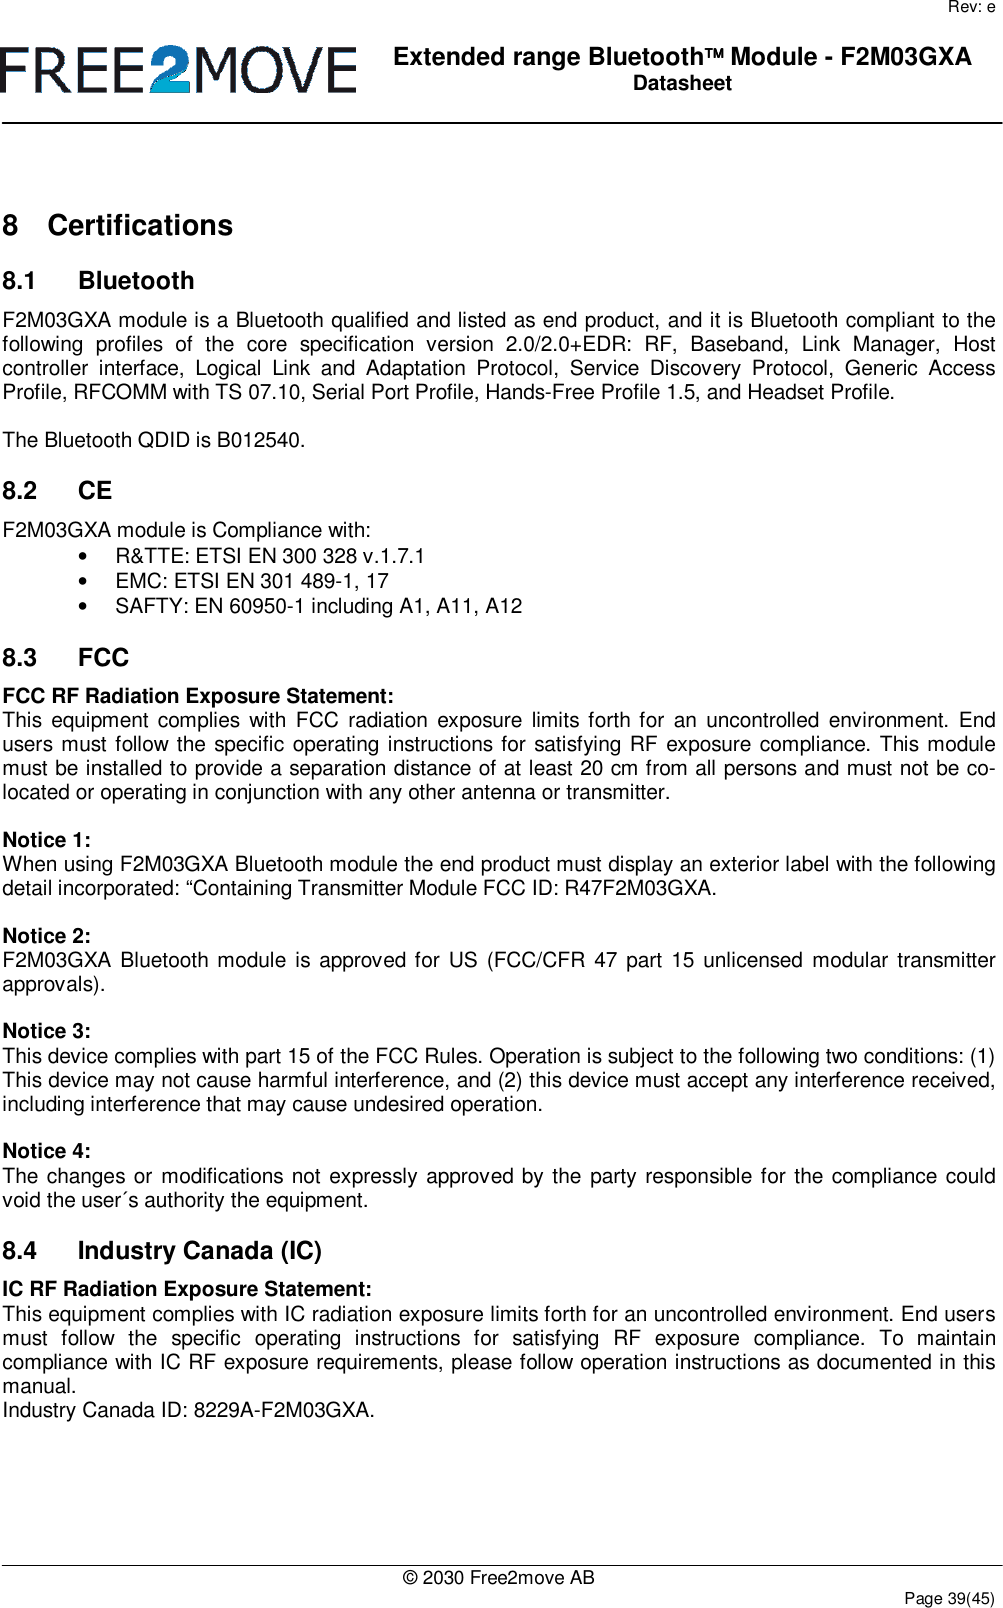 Free2move F2M03GXA Bluetooth module User Manual Exhibit 8